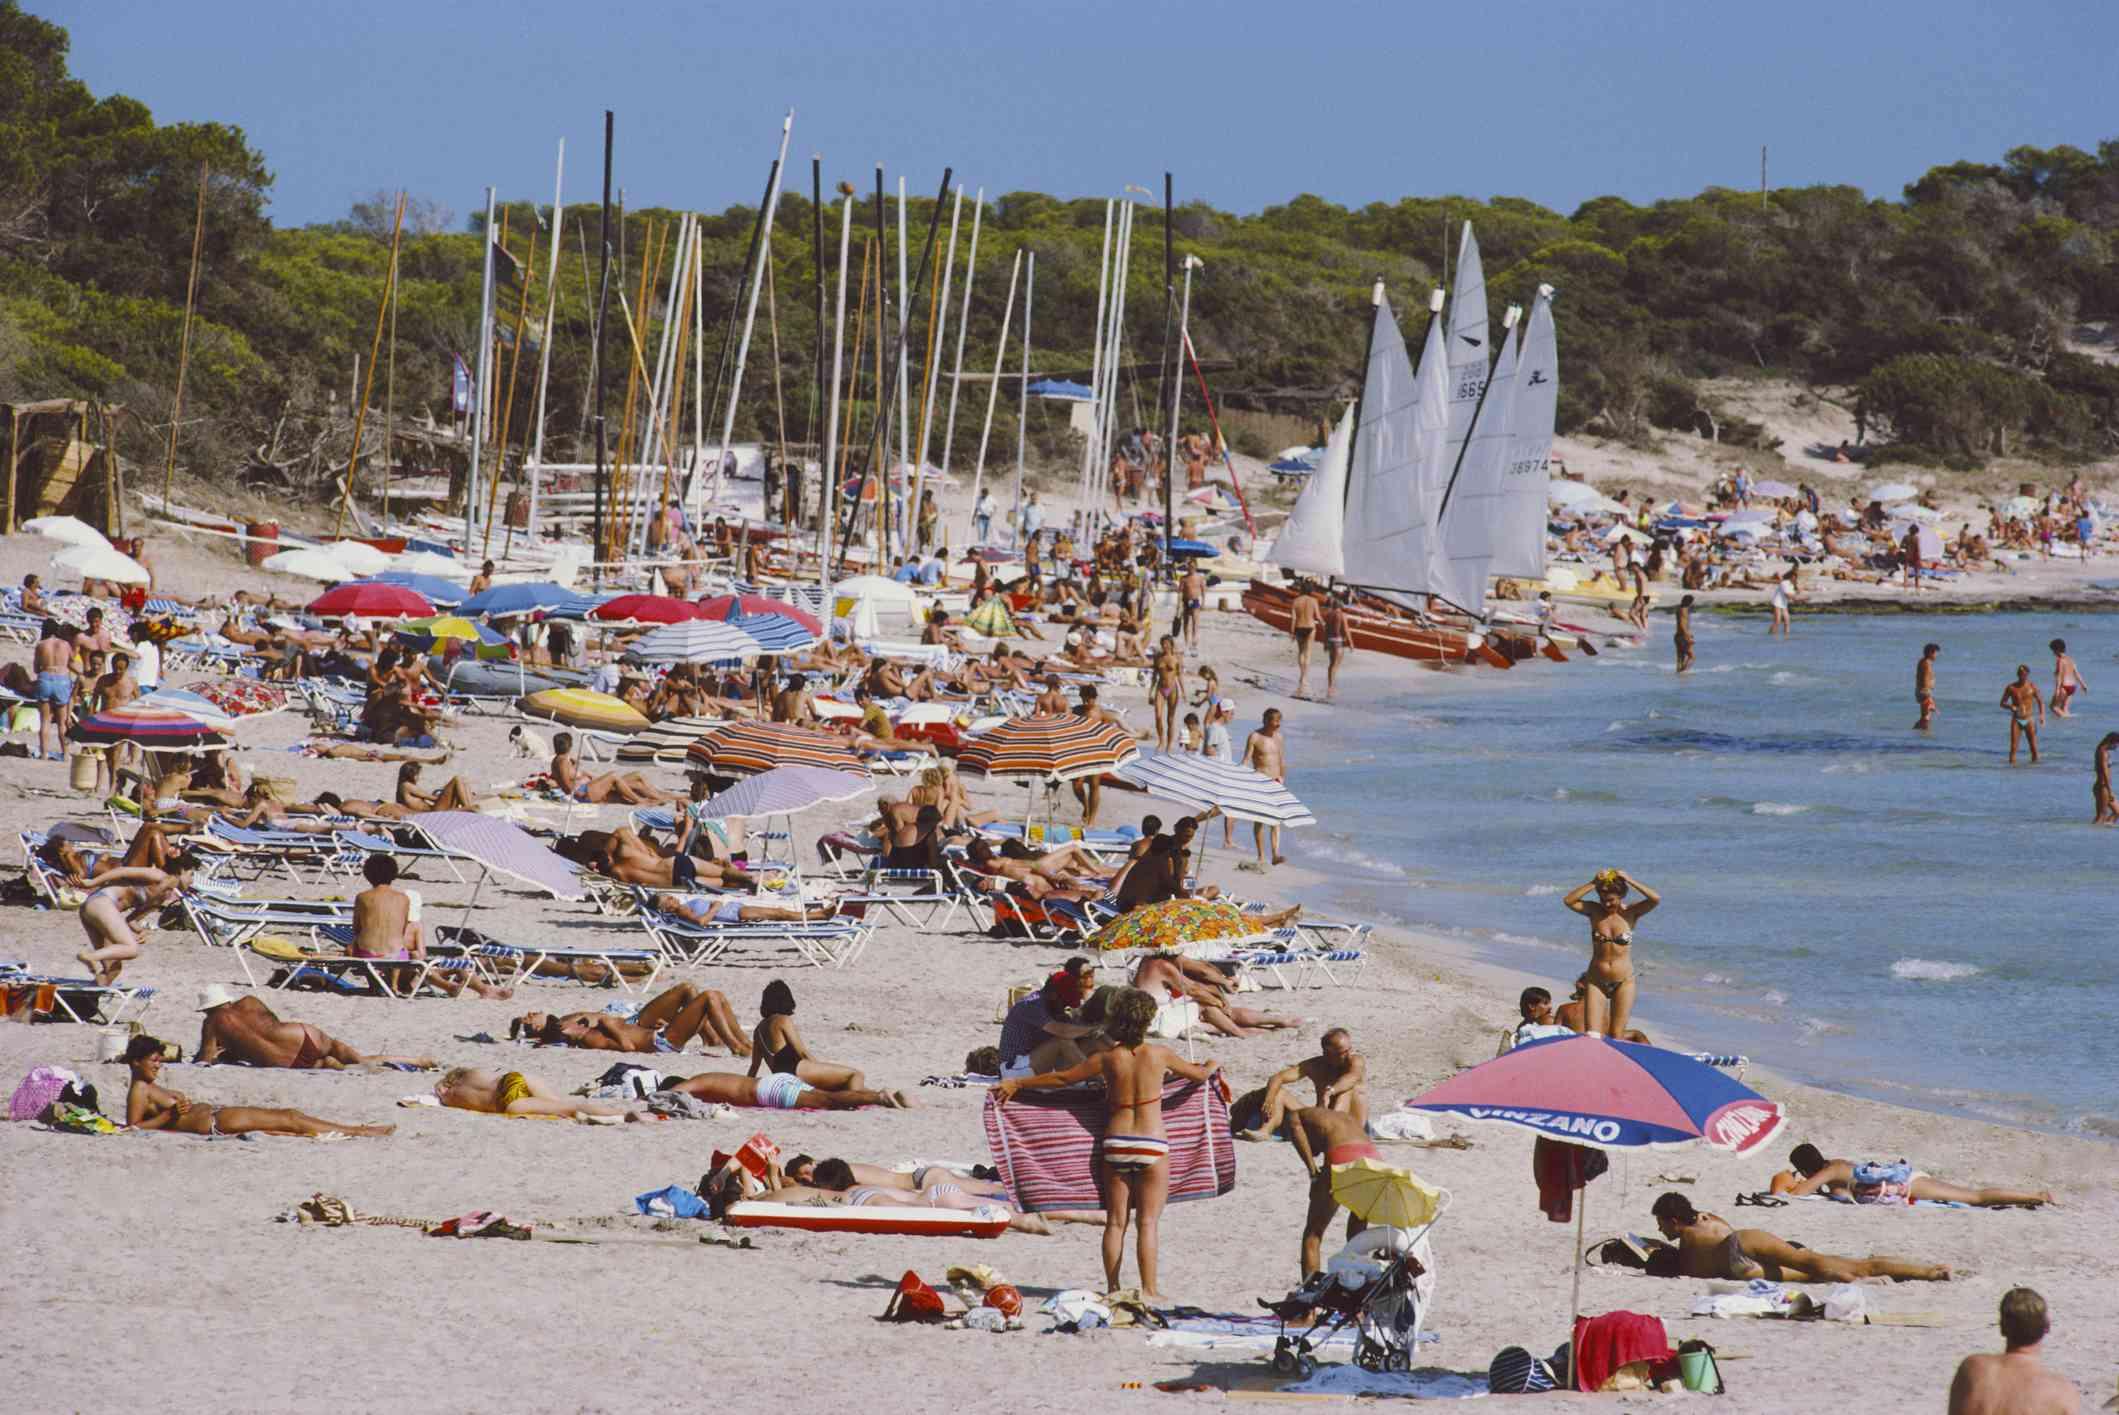 Beach, St Tropez, France